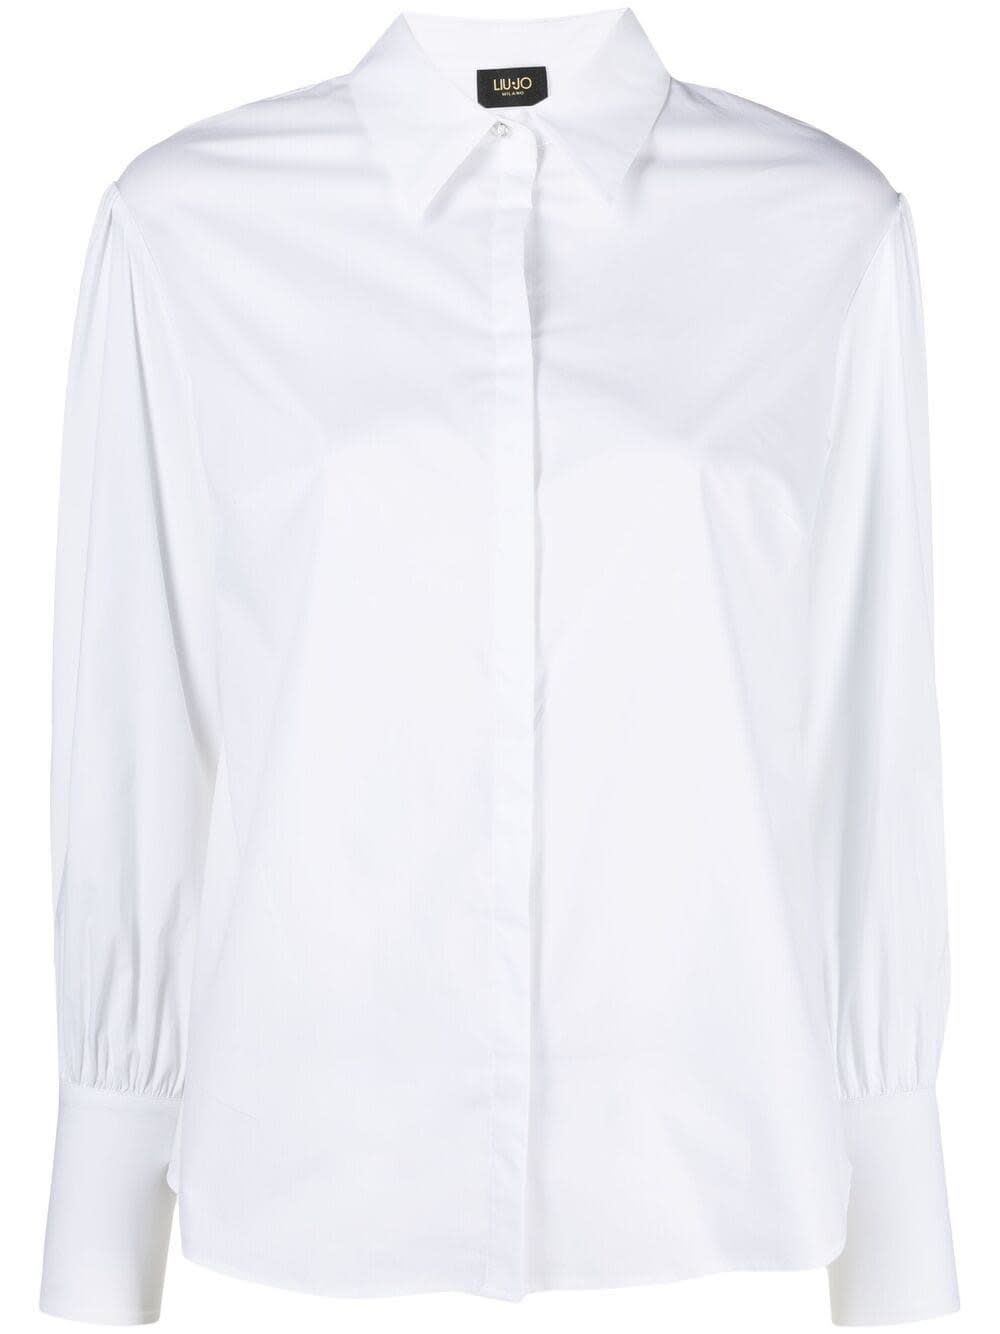 Liu •jo Cottons WHITE COTTON SHIRT